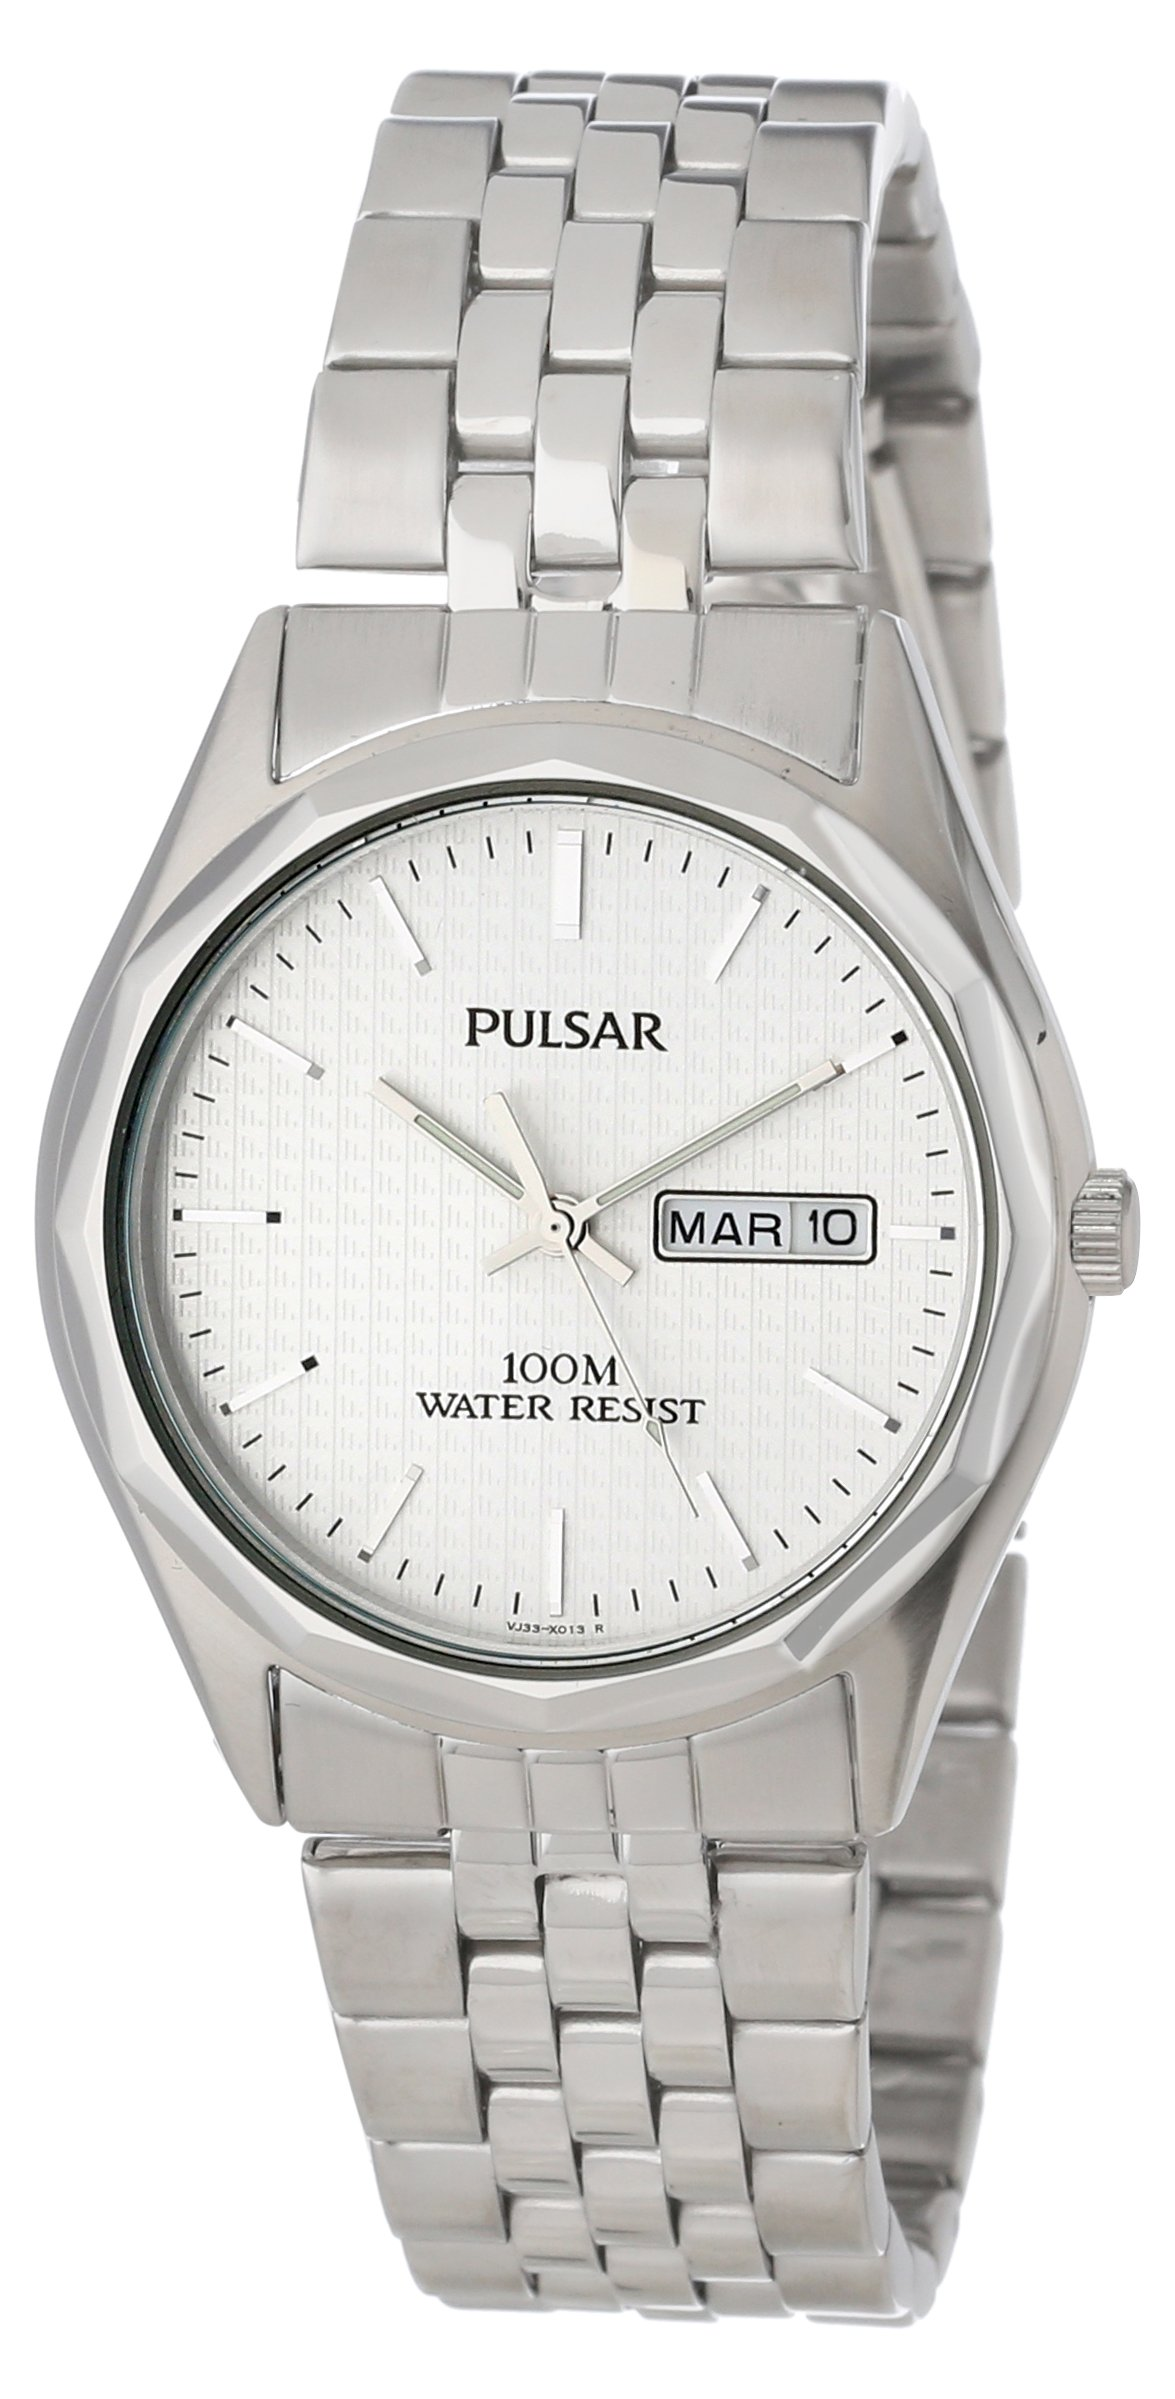 Mens Watches Pulsar Pj6029 Dress Silver Tone Watch Was Fossil Jr1515